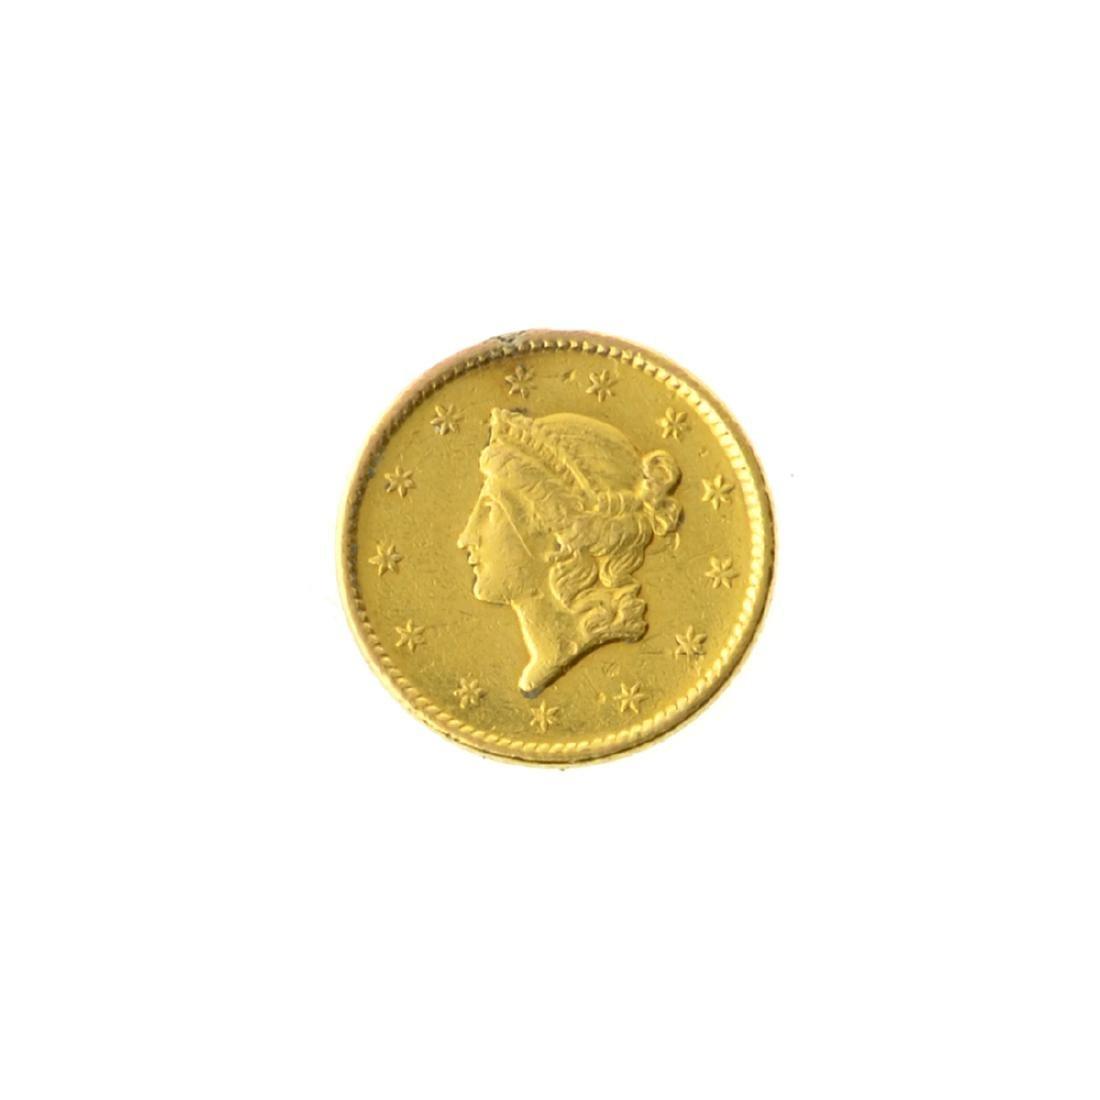 *1851 $1 U.S. Liberty Head Gold Coin (JG-MRT)